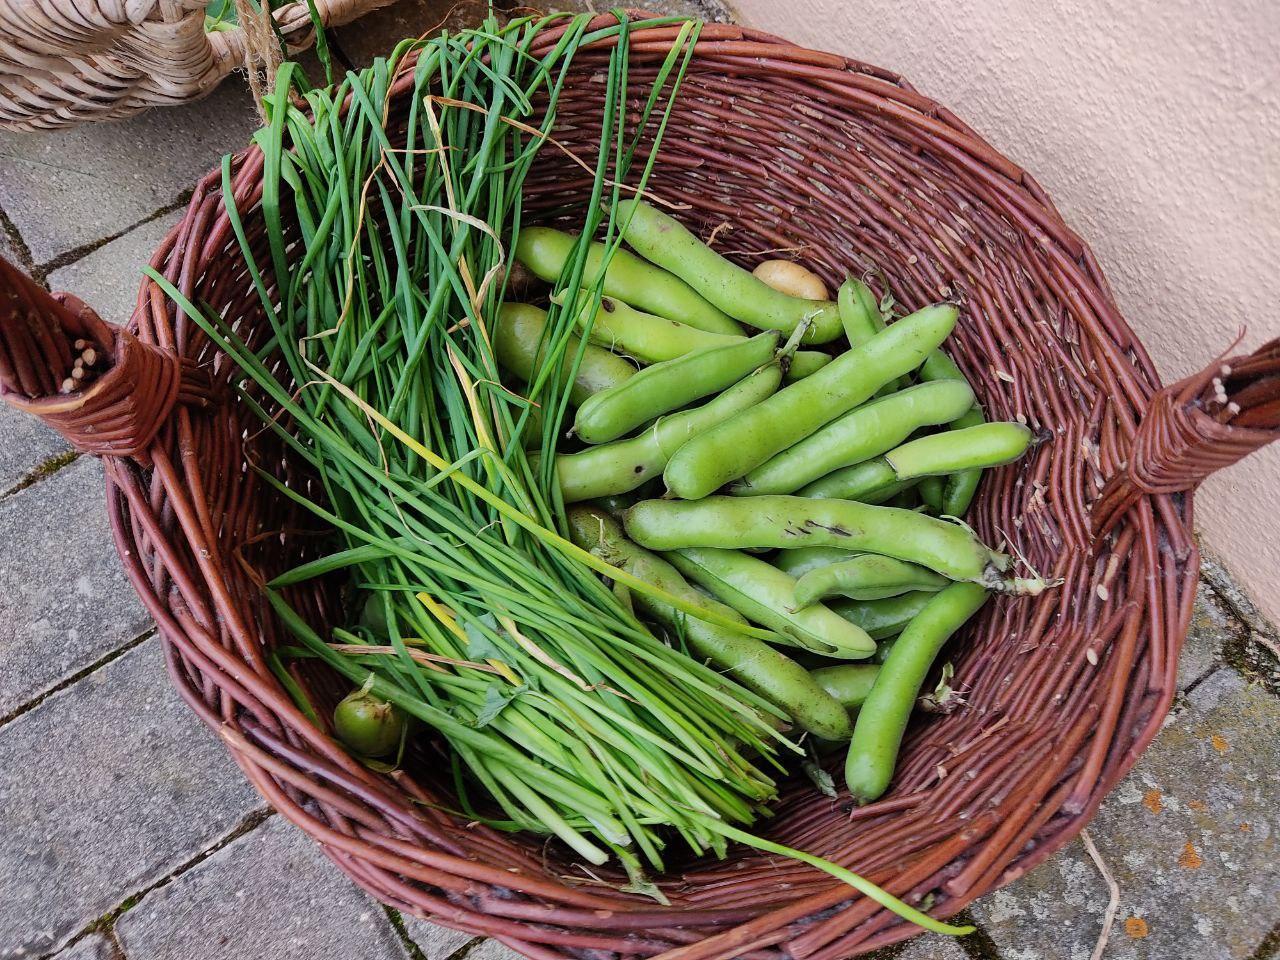 Lebensmittel selber anbauen - warum?